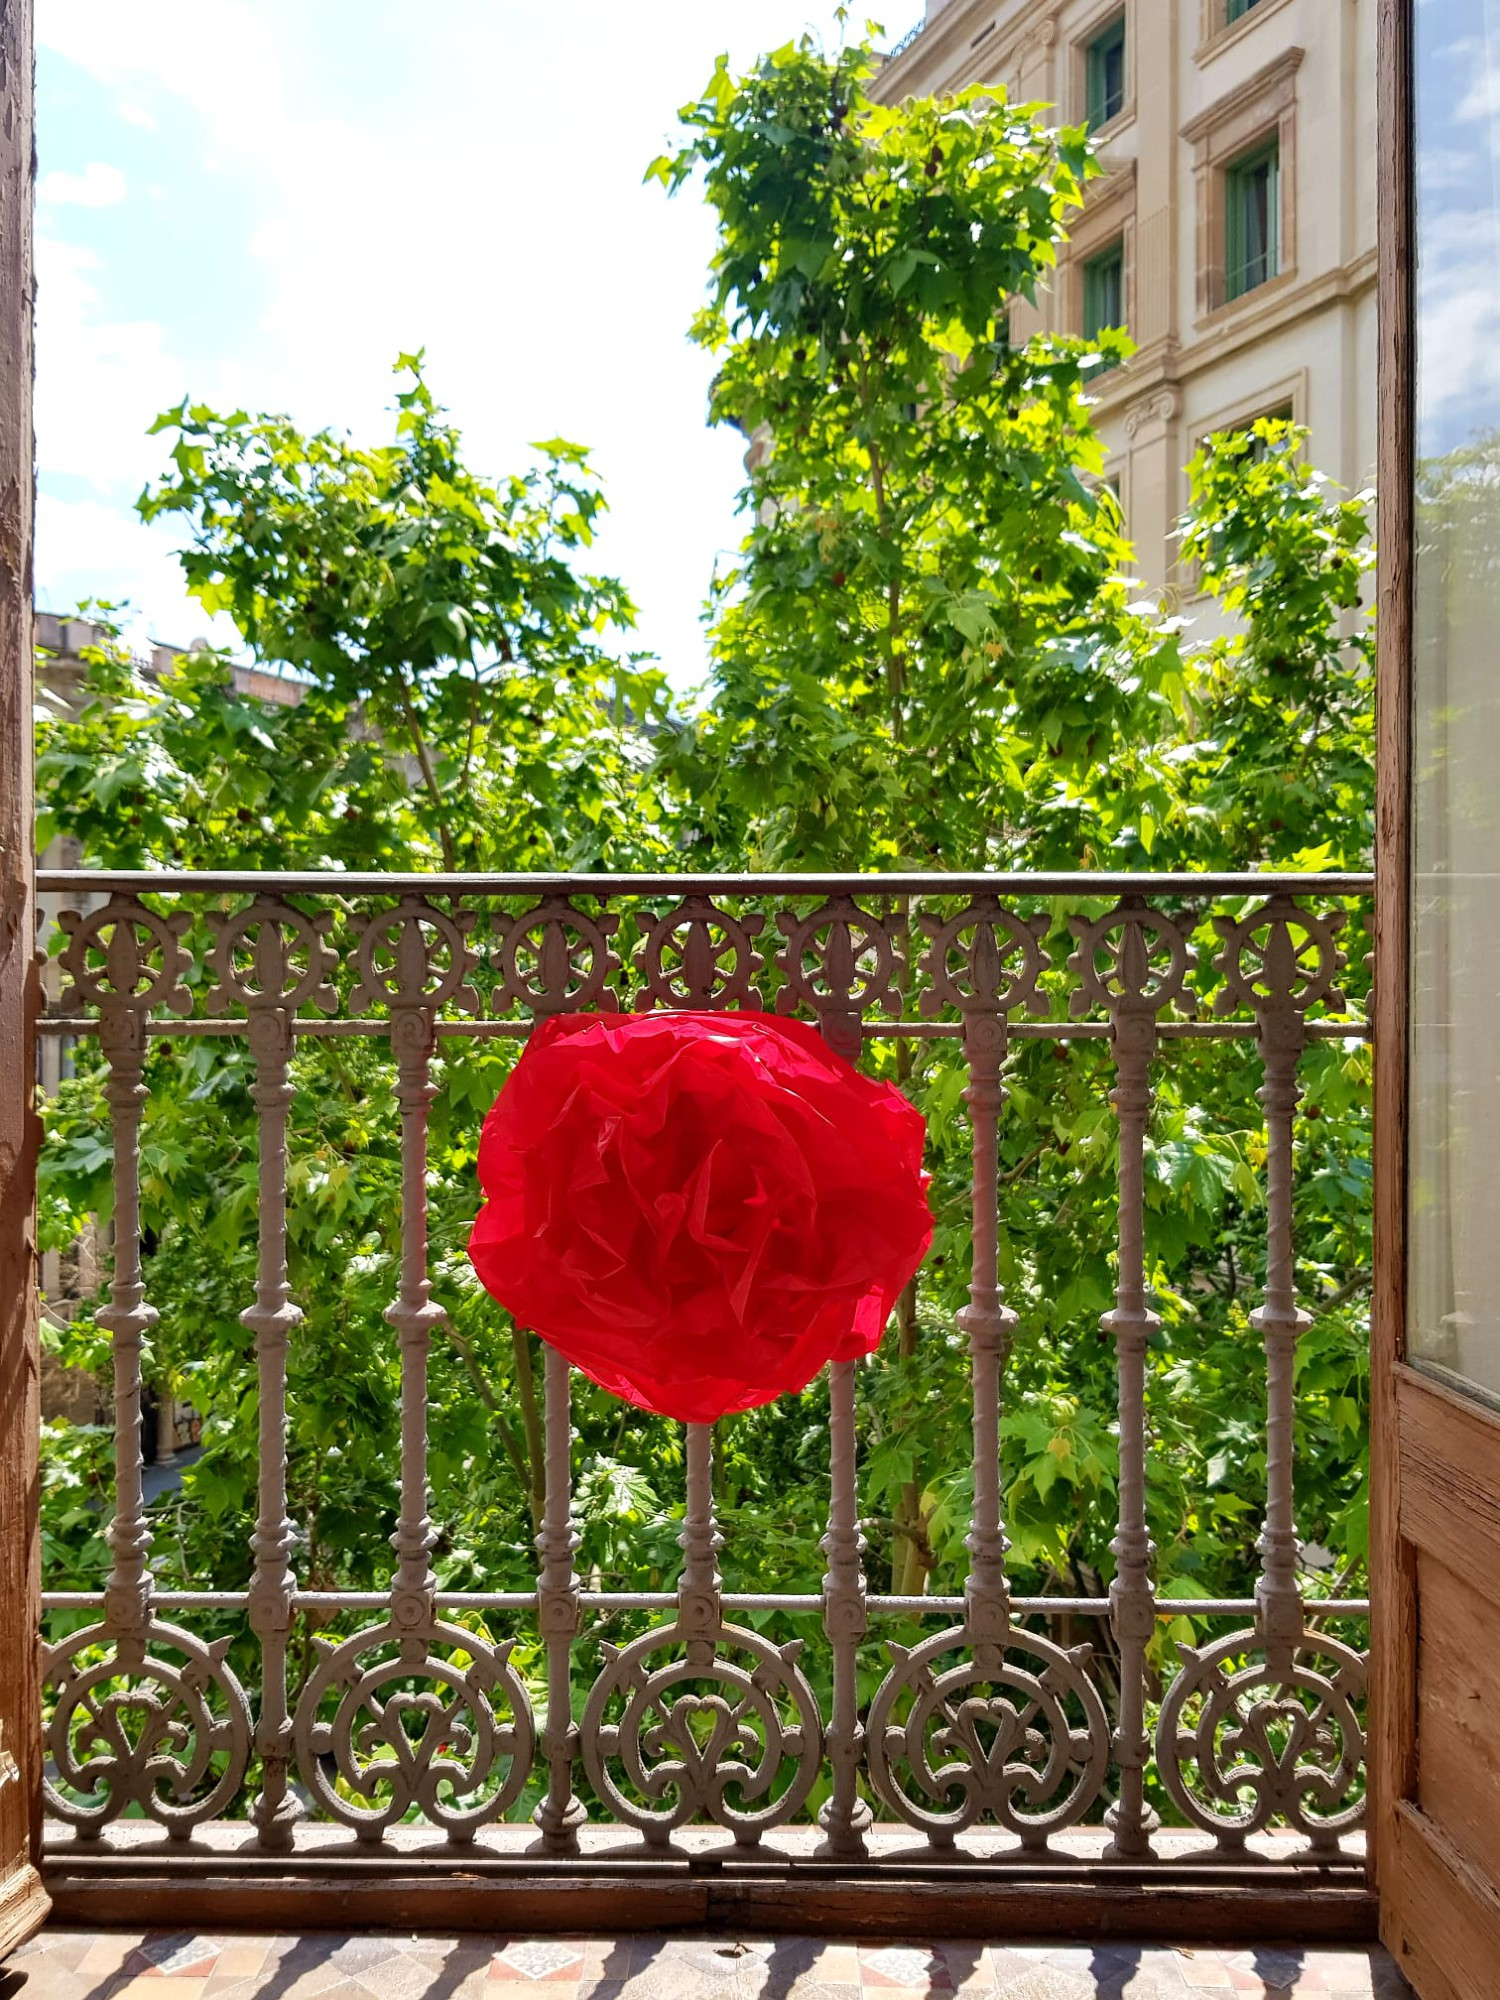 Roses de Sant Jordi 2020